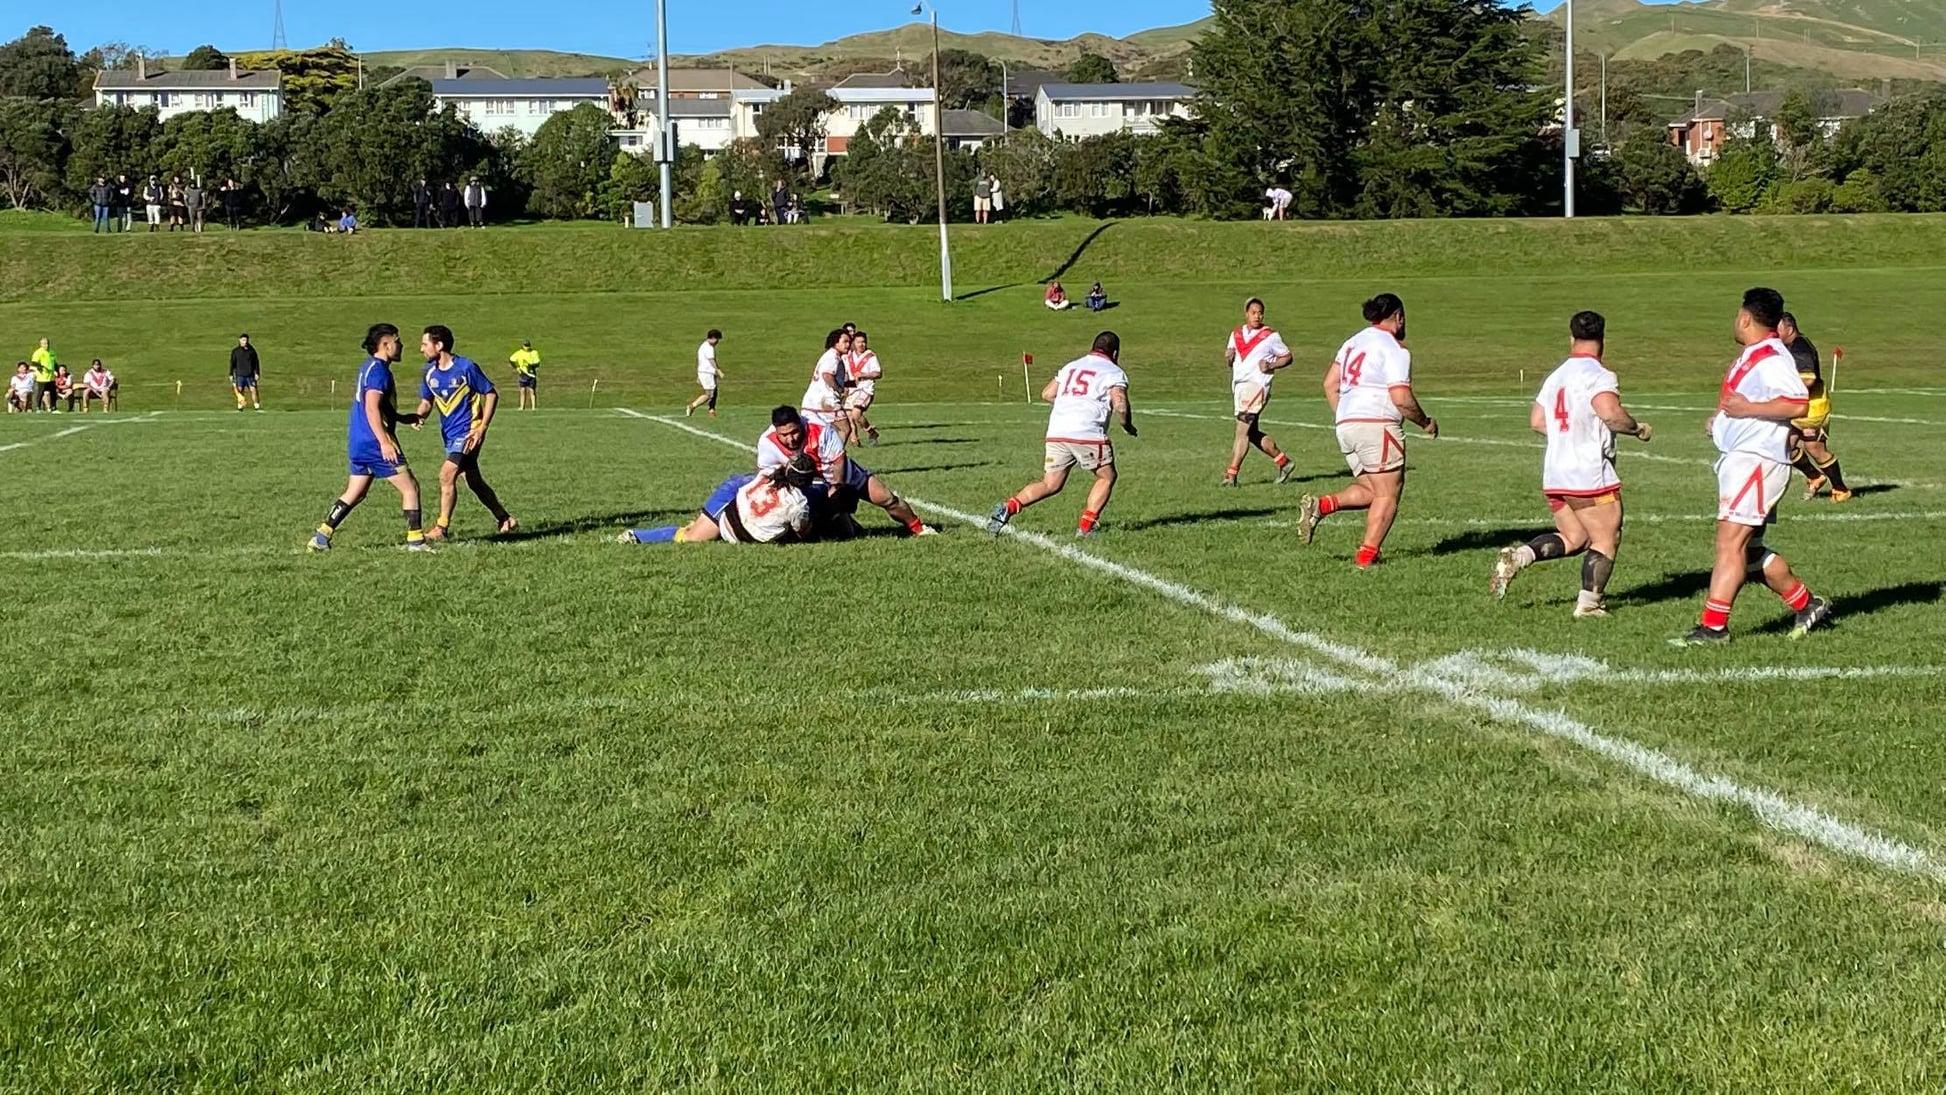 St George to face Wainuiomata in Wellington Premier 2 Grand Final